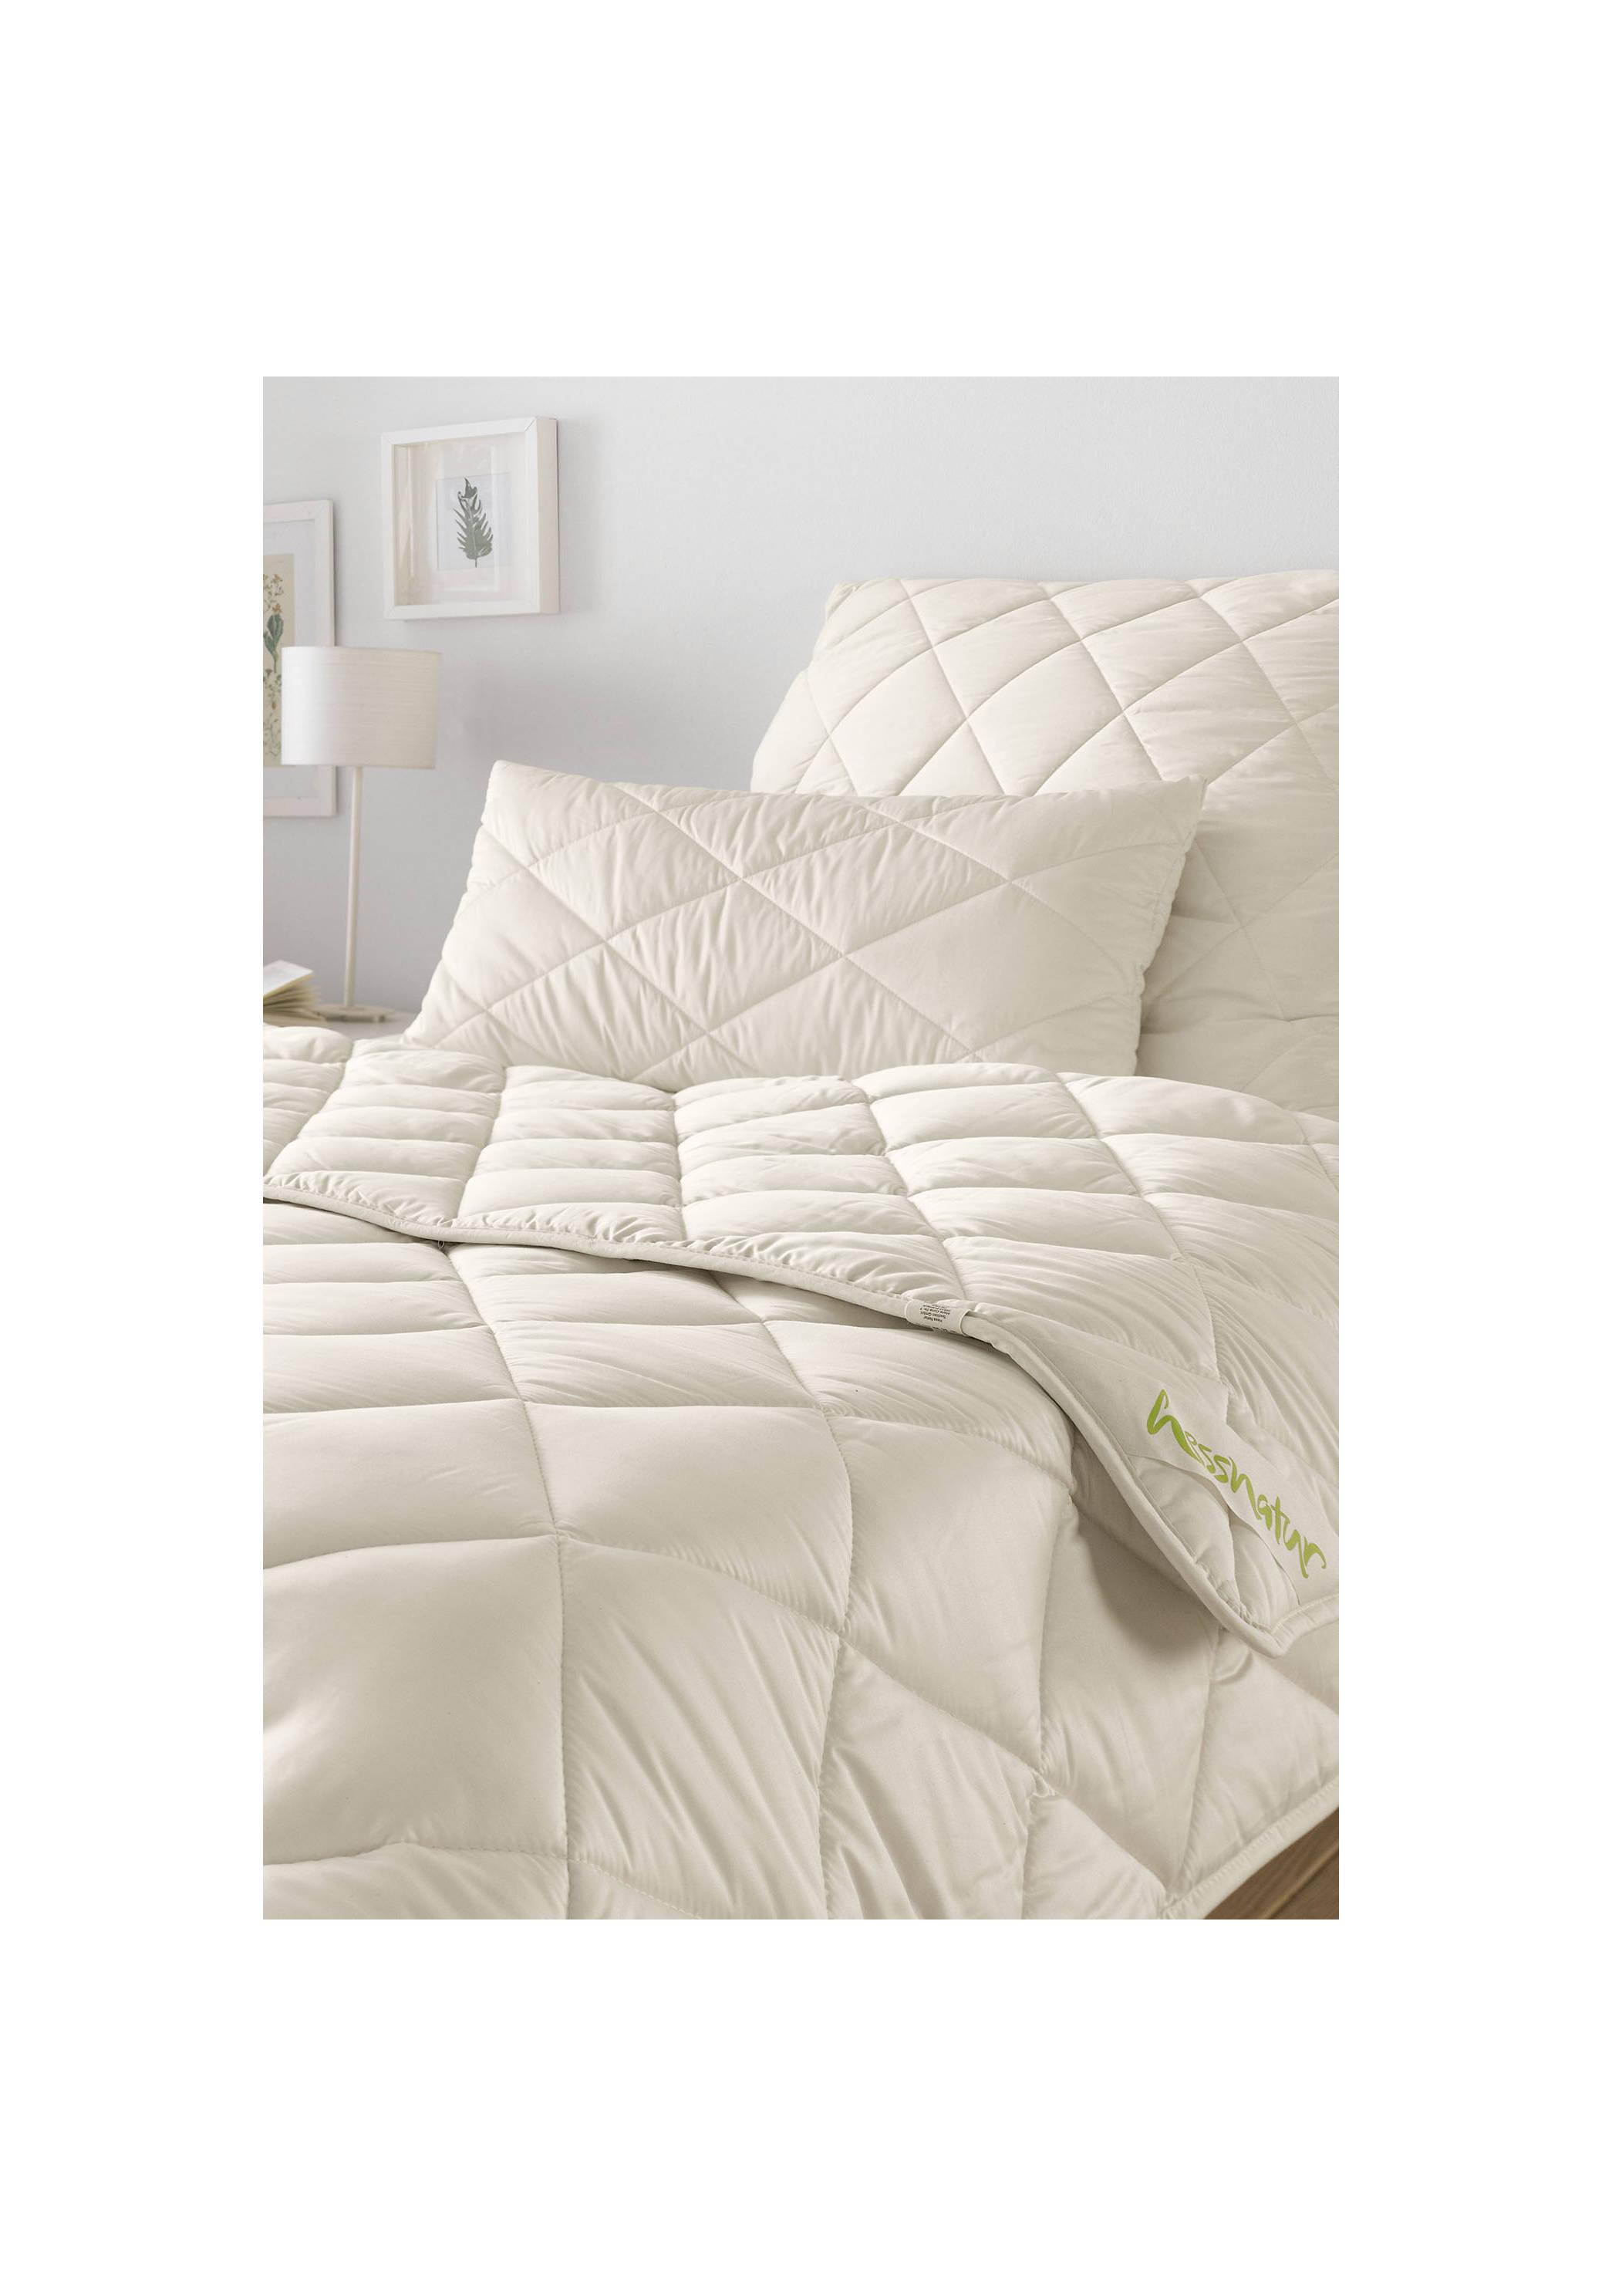 duo bettdecke bio baumwolle hessnatur schweiz. Black Bedroom Furniture Sets. Home Design Ideas